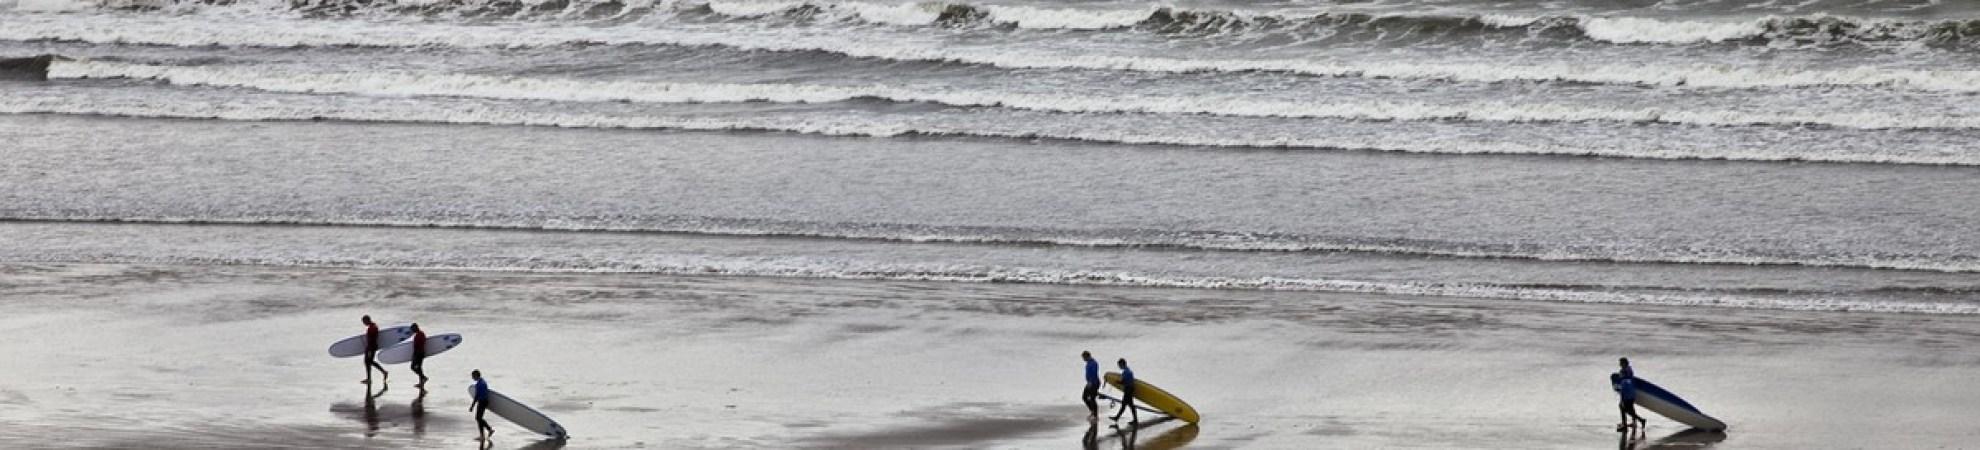 best surf beaches for beginners